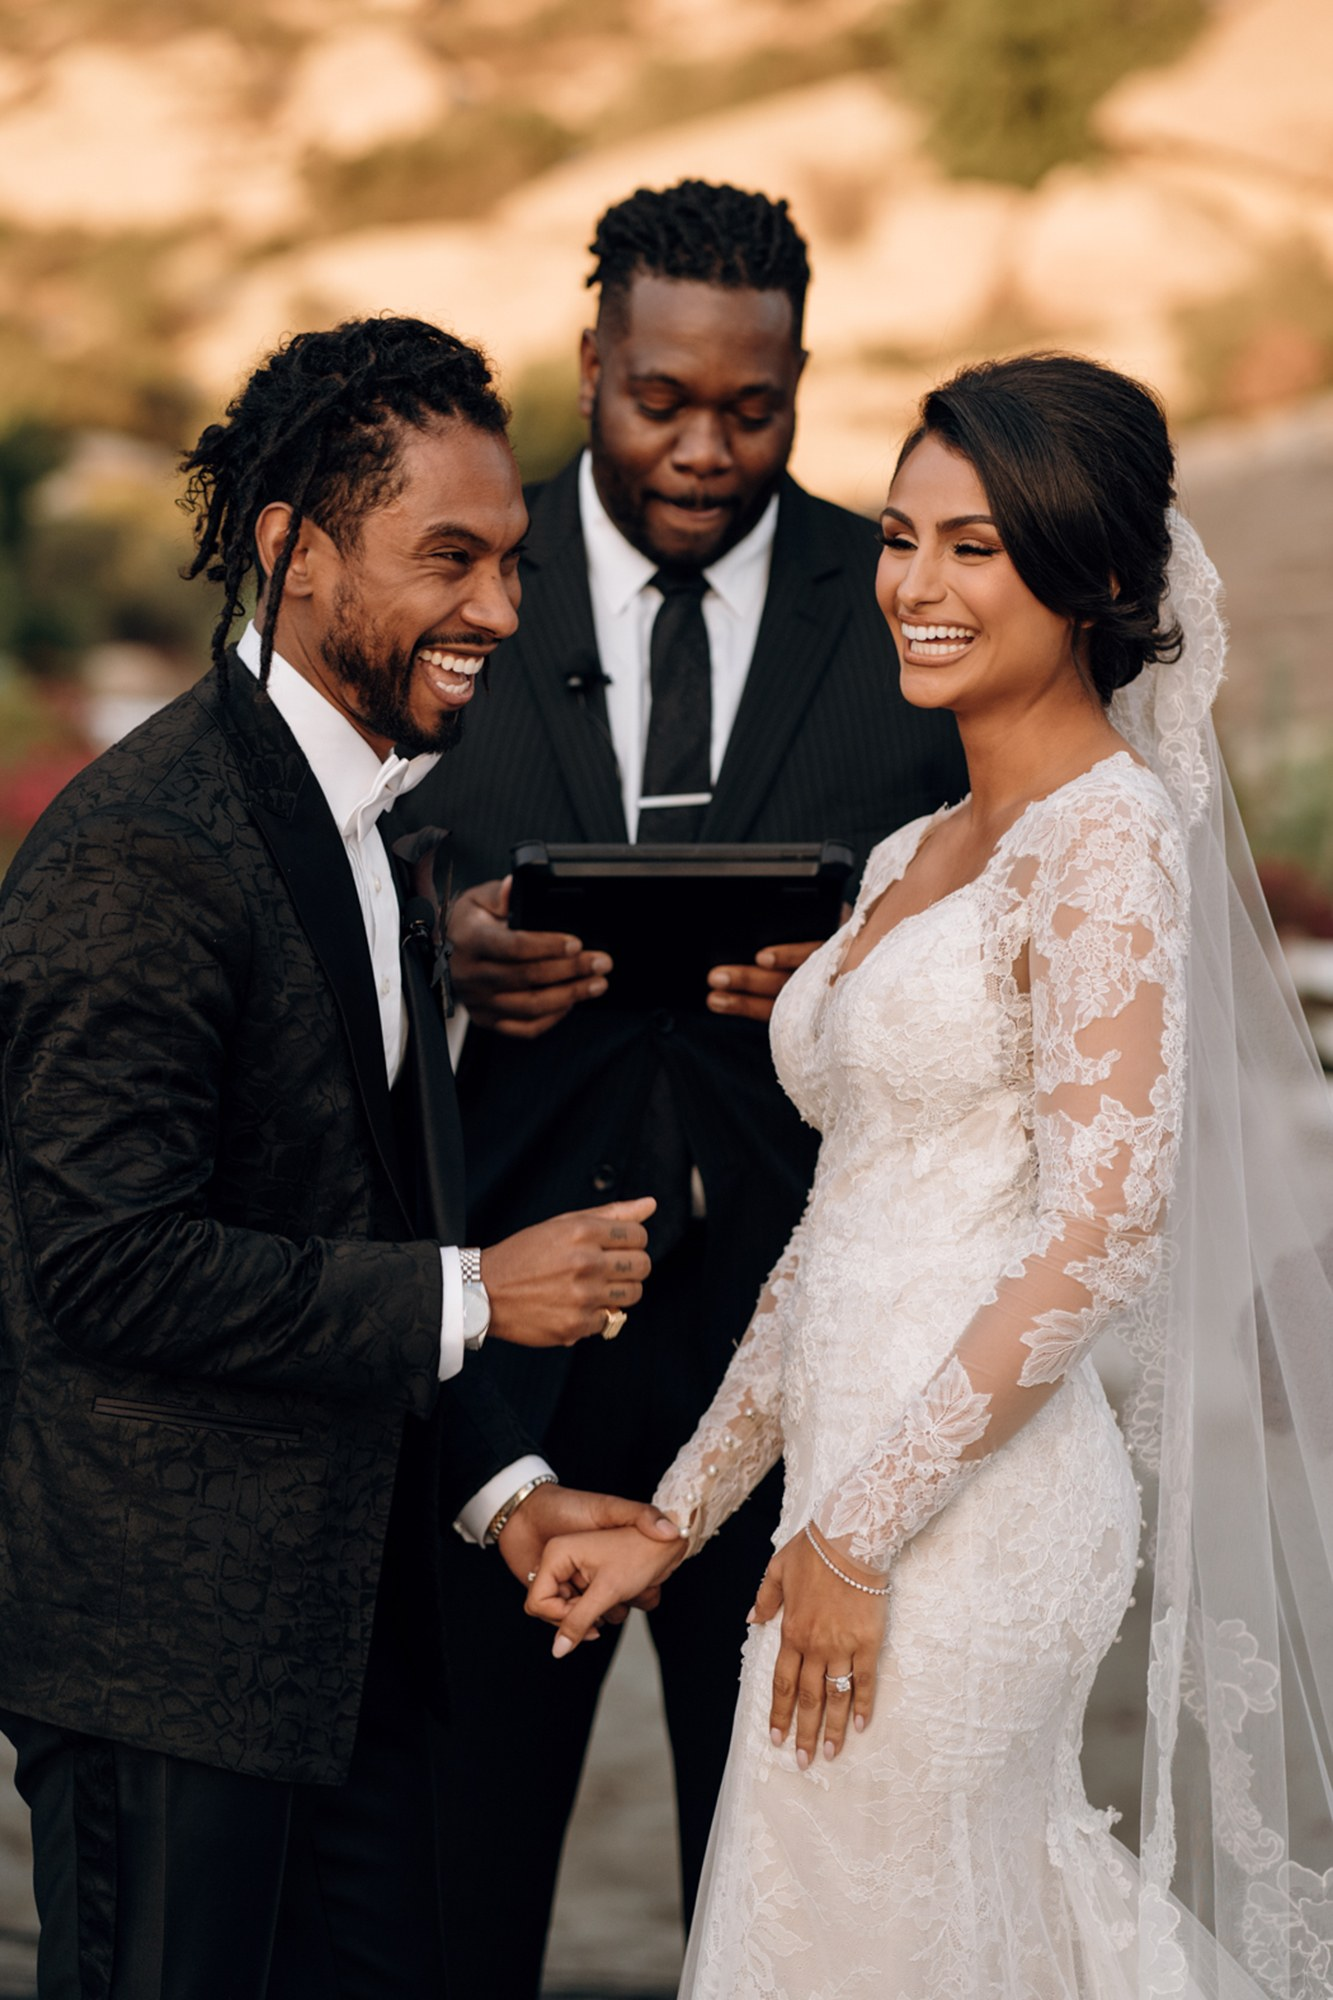 Miguel and nazanin wedding photos monique lhuillier bride